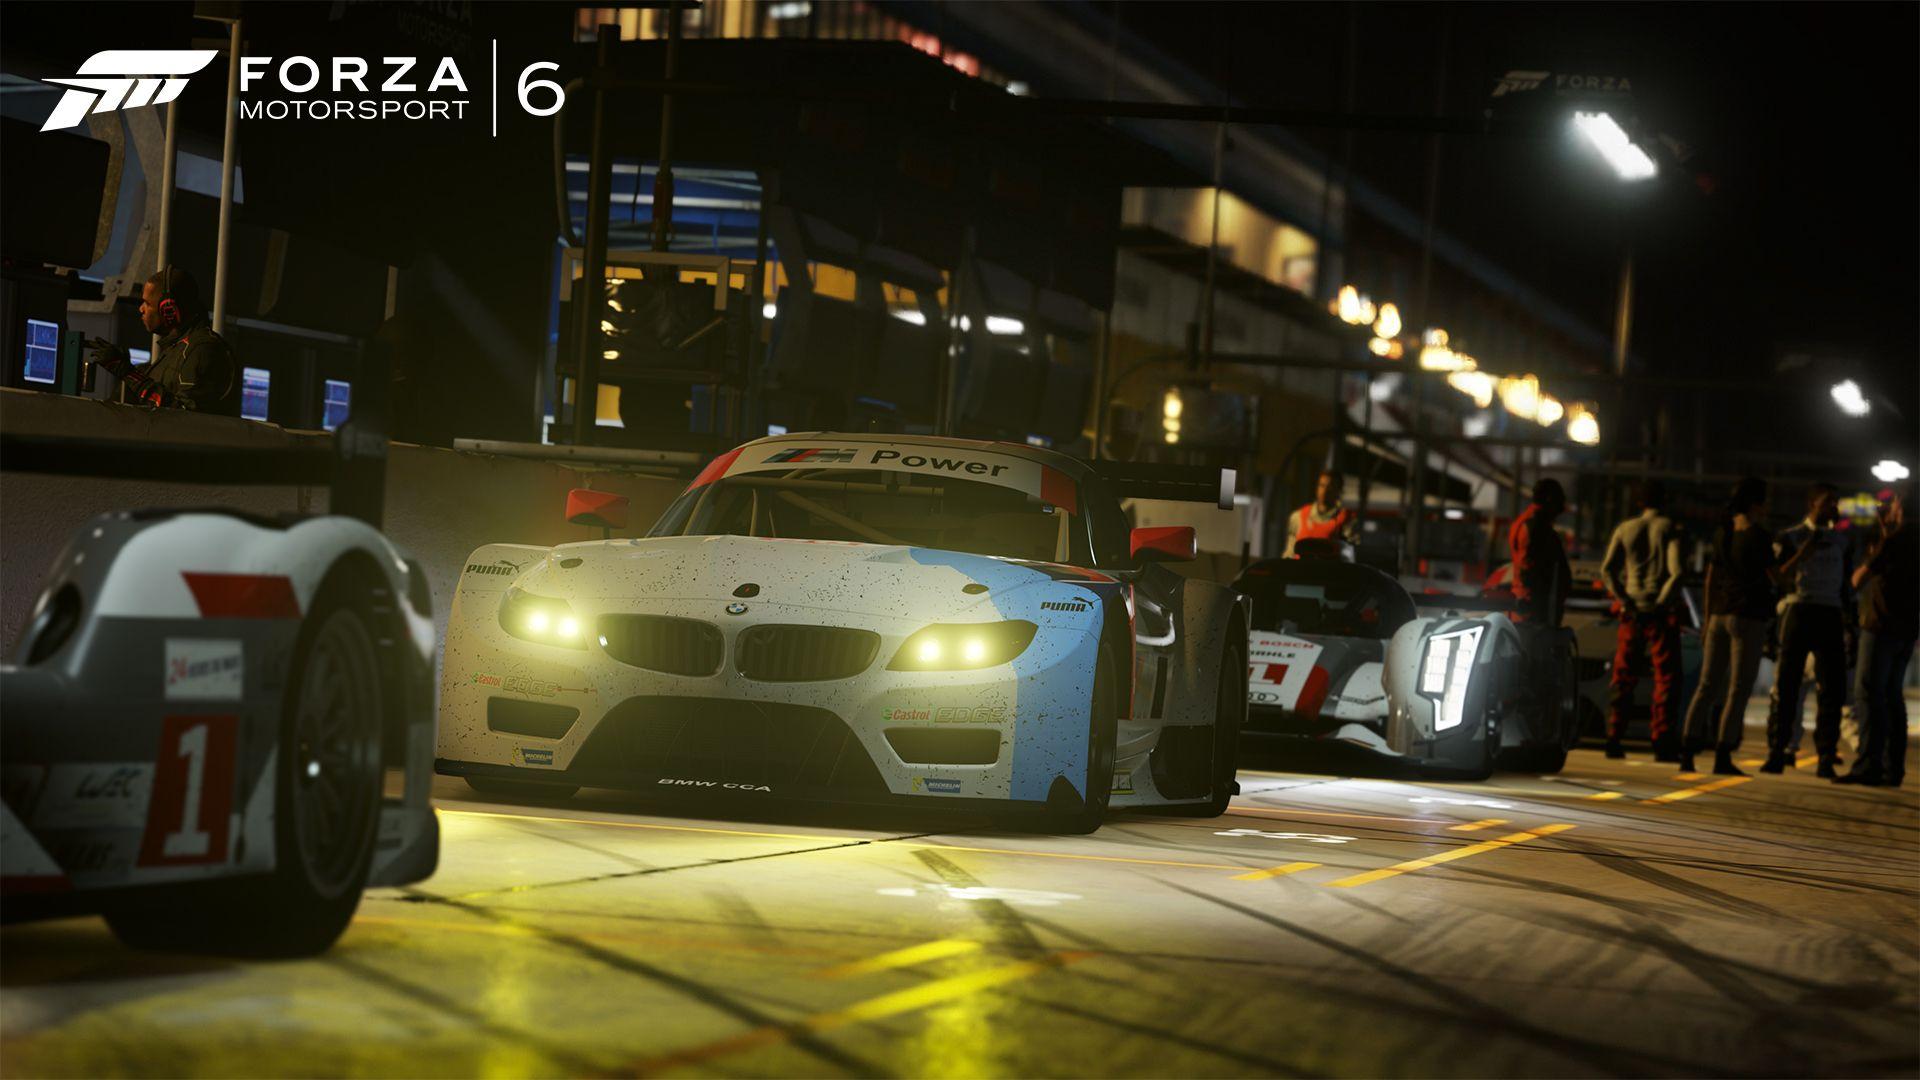 Forza Motorsport 6 recenzja (2)